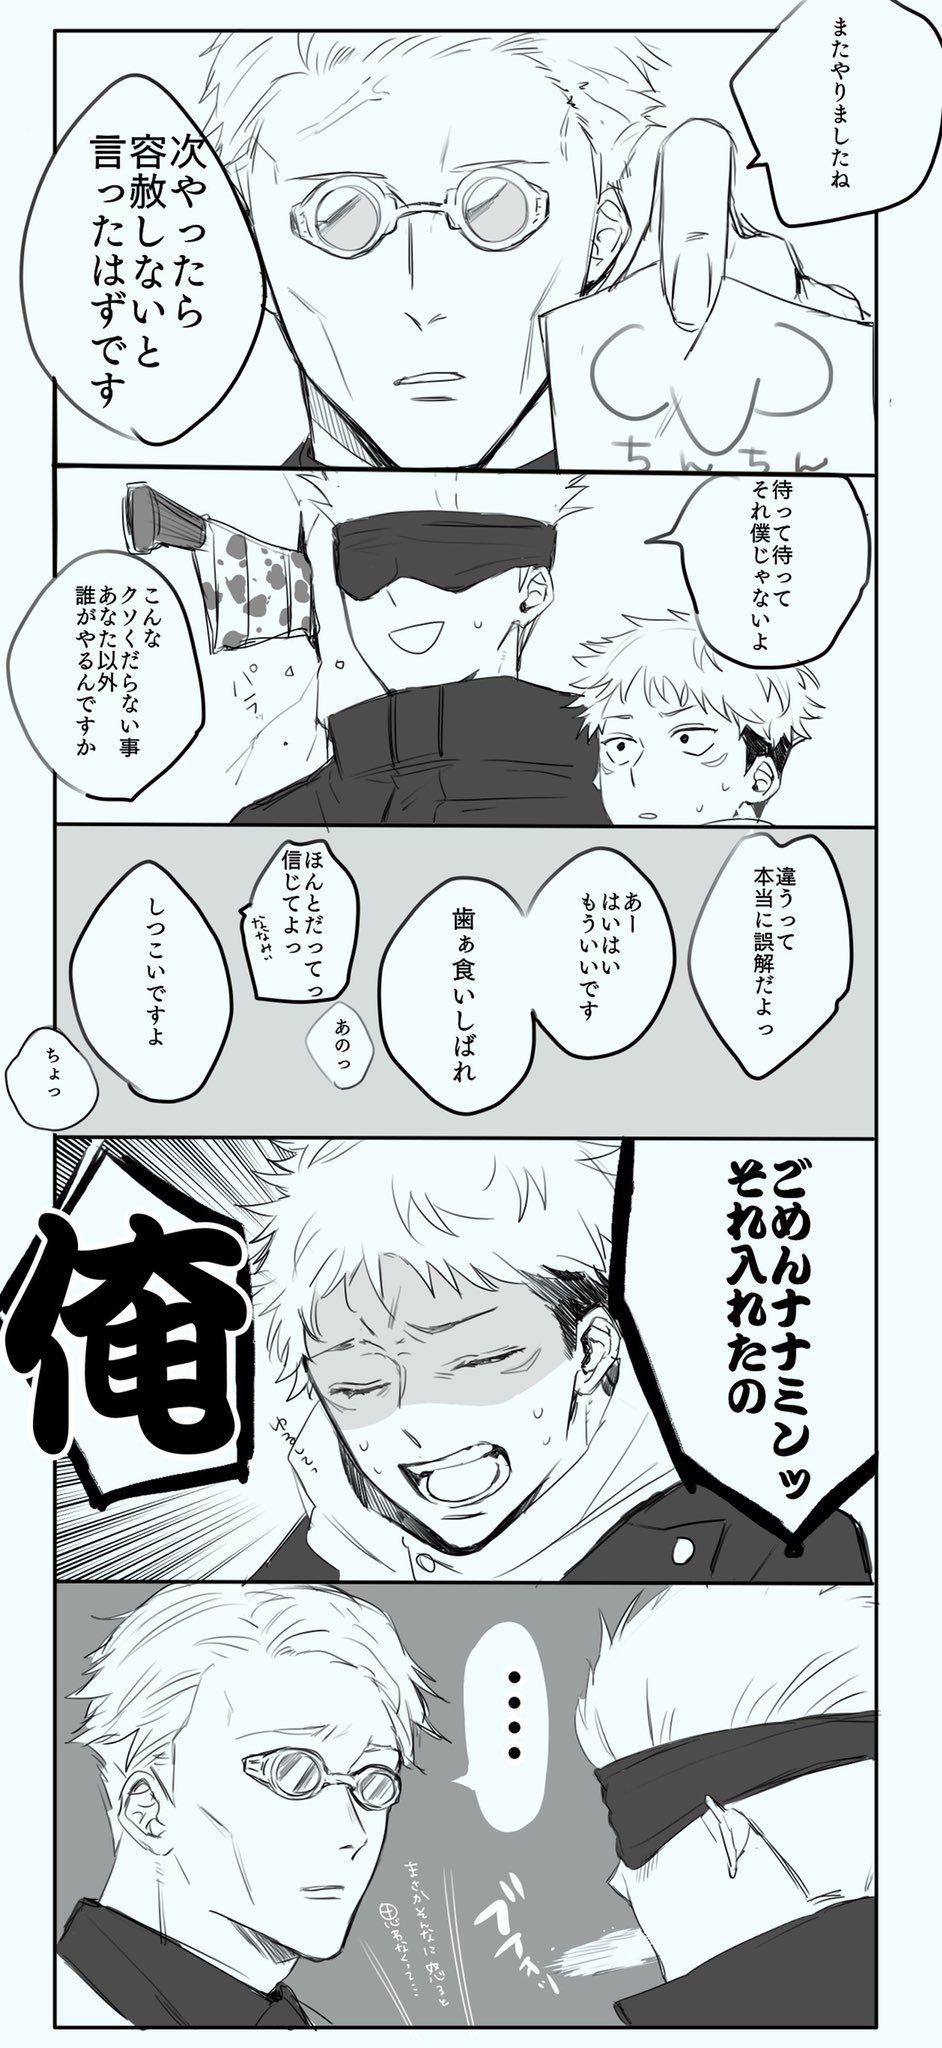 twitter jujutsu anime nanami